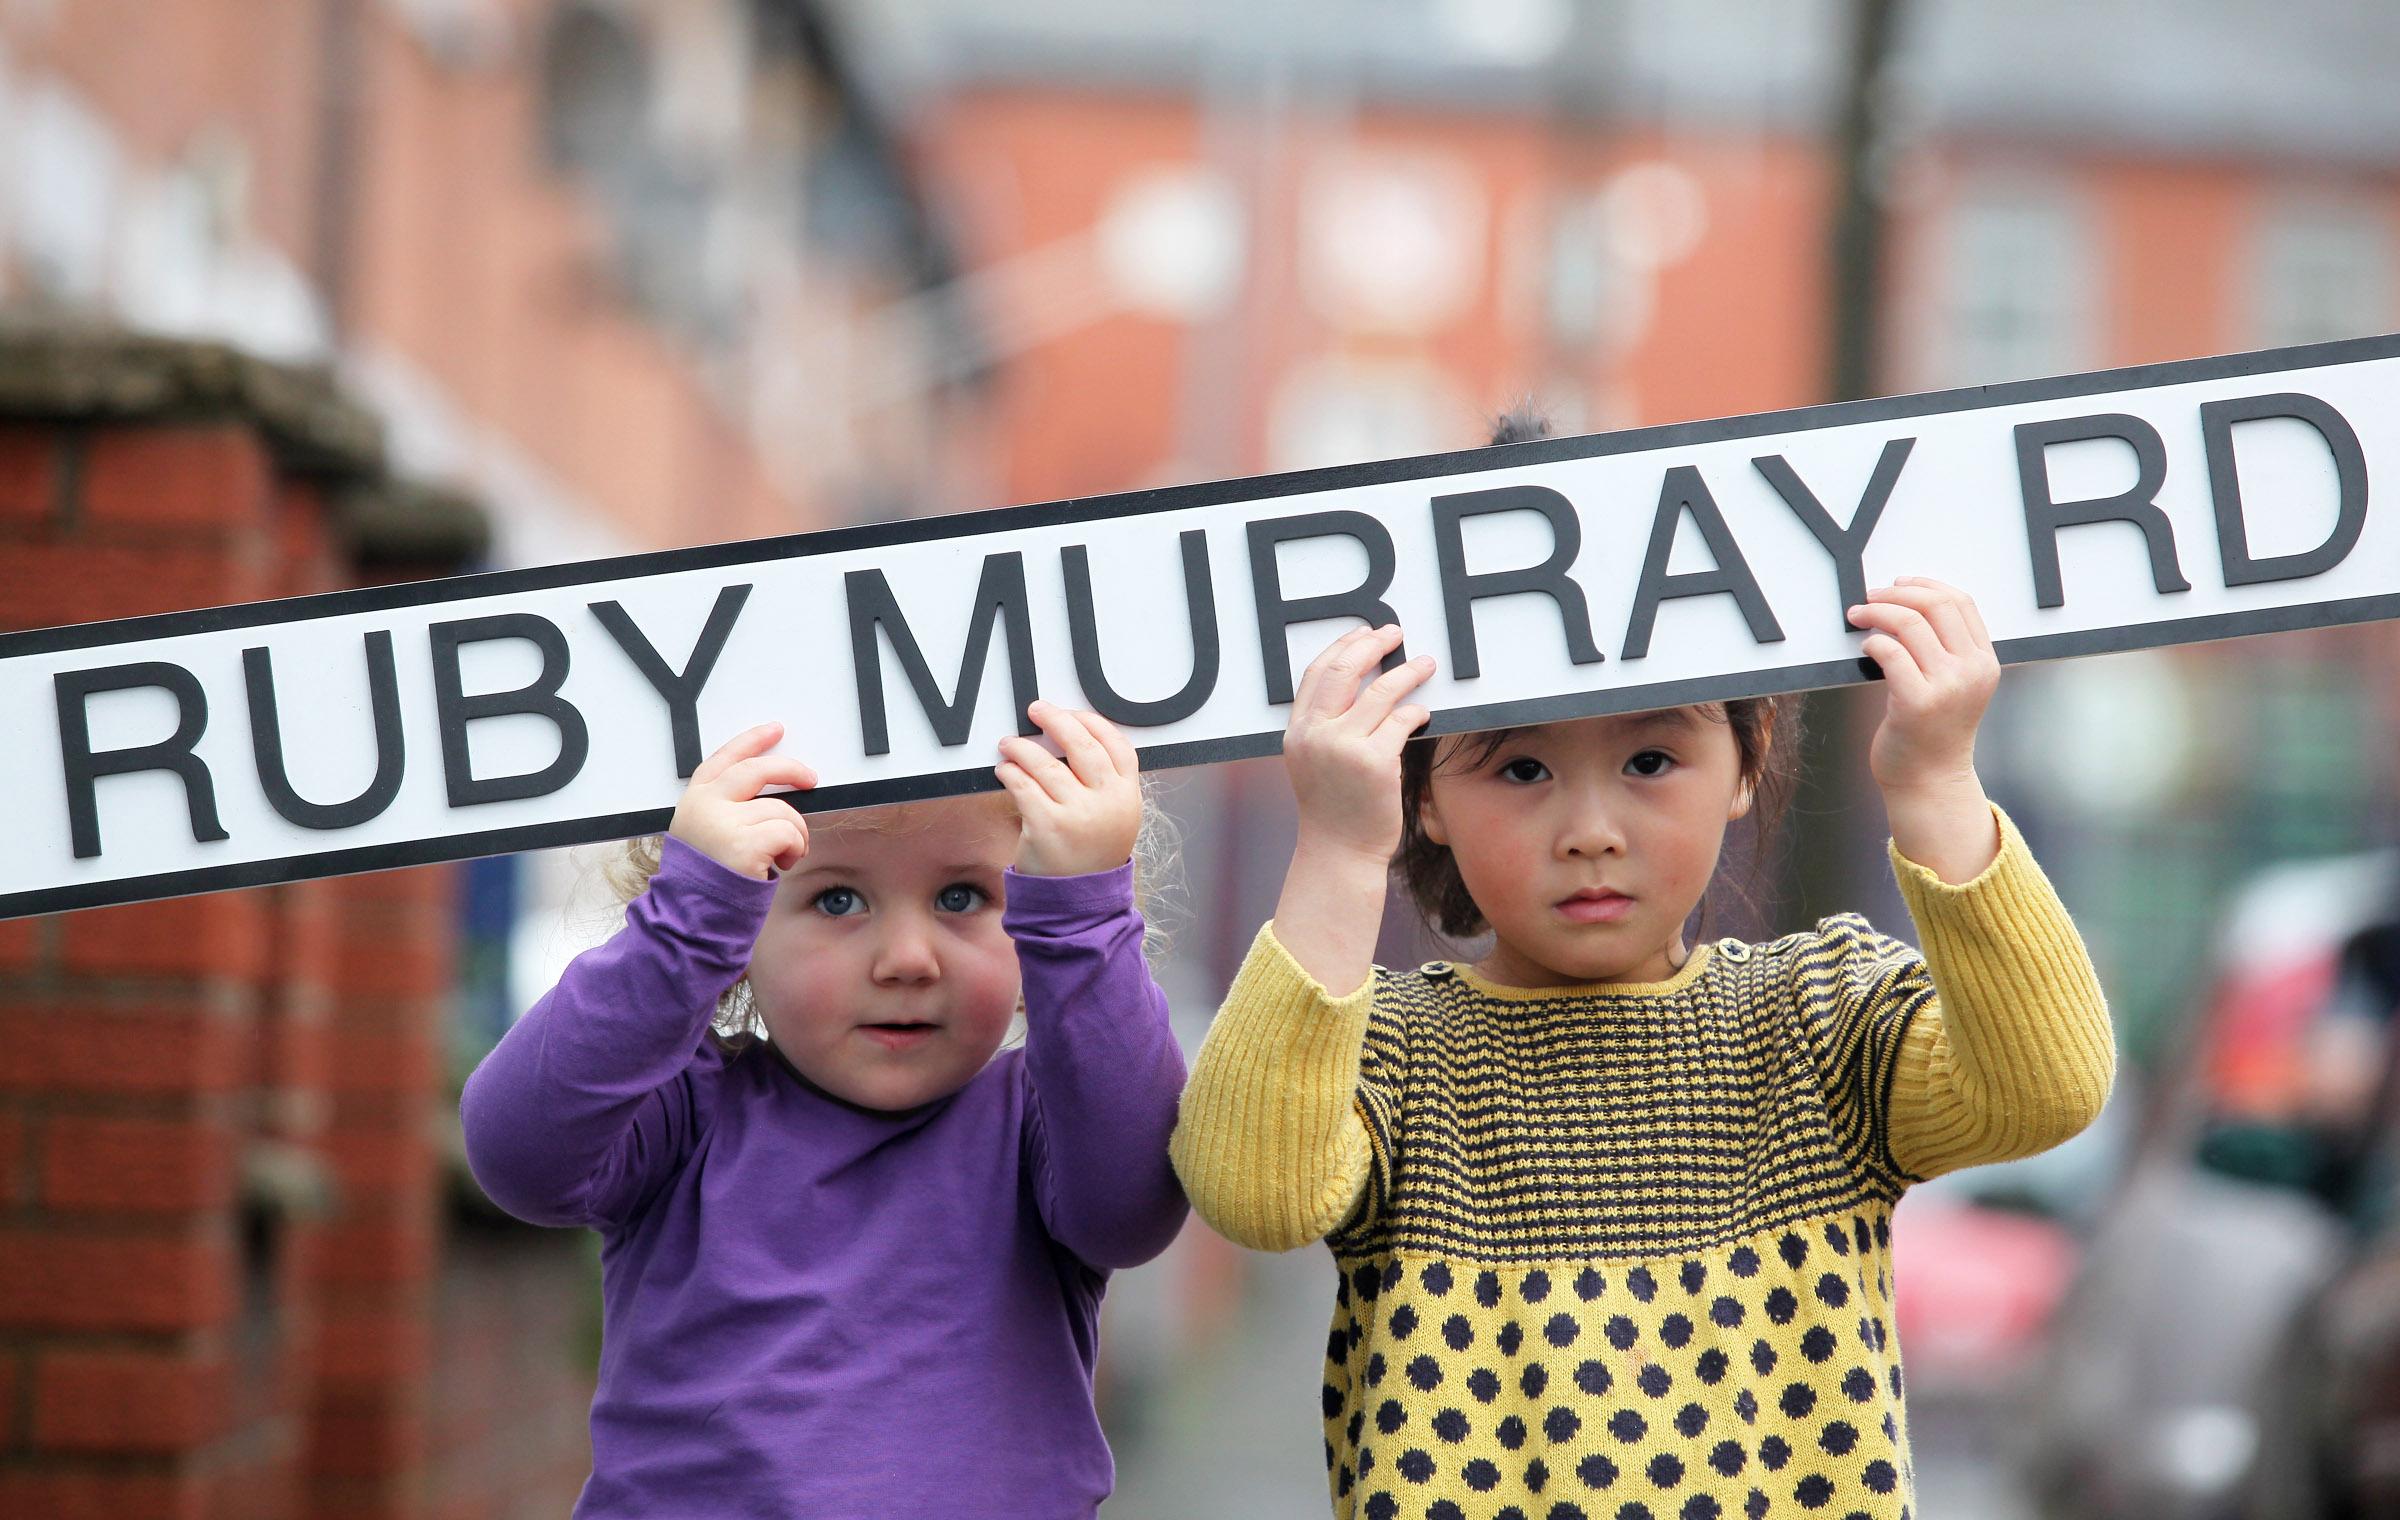 Reclaim street names